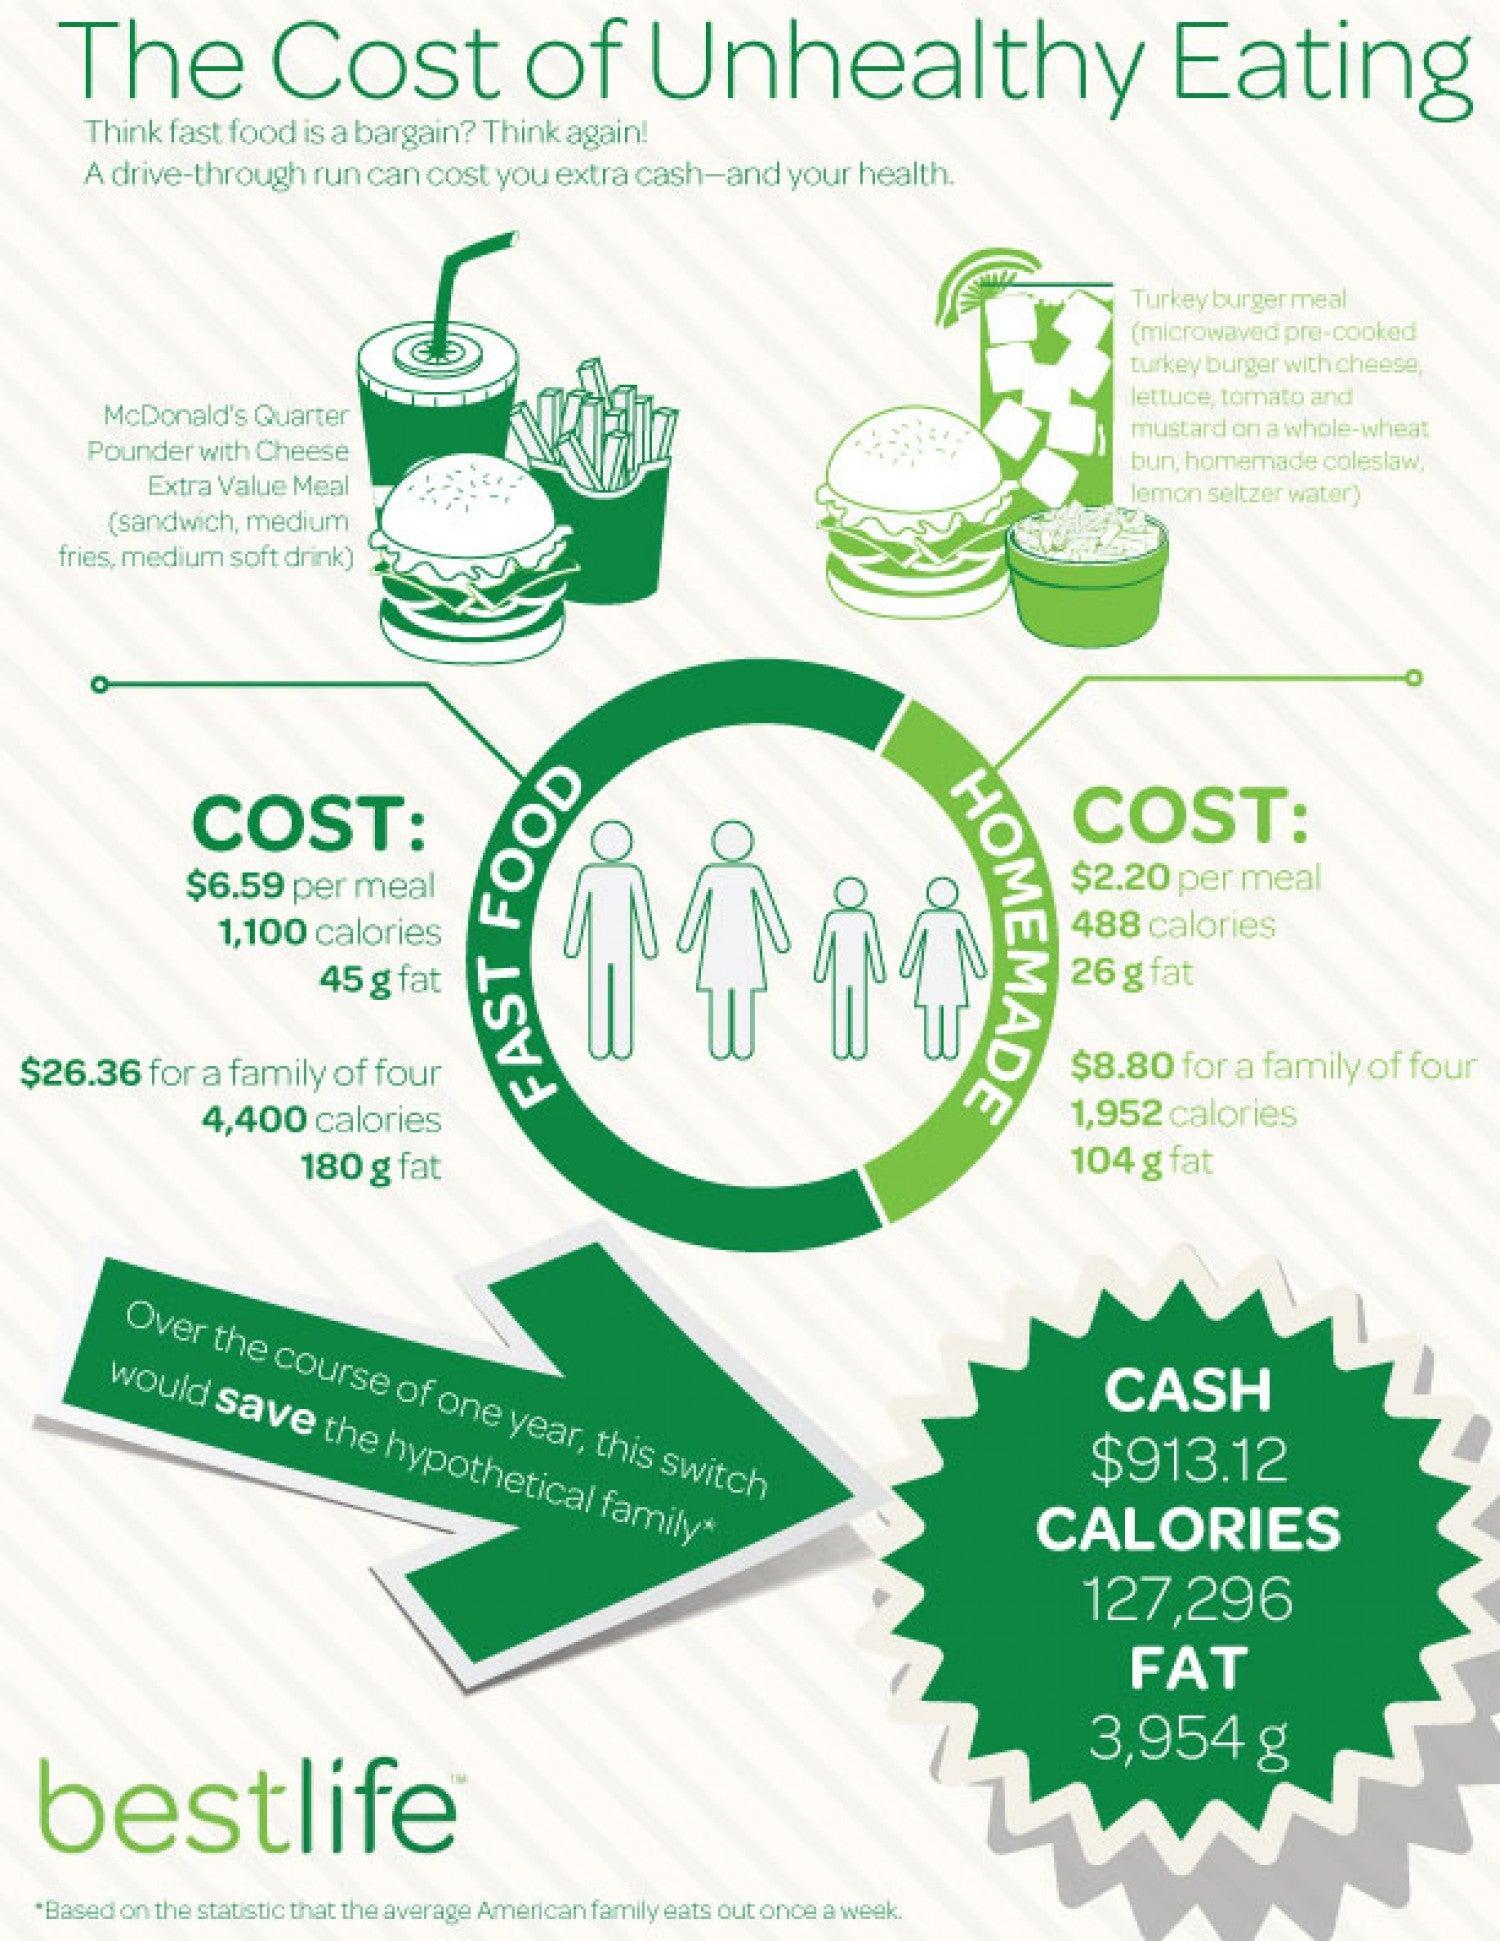 the-cost-of-unhealthy-eating_51fbc2ac1c9b4_w1500.jpeg